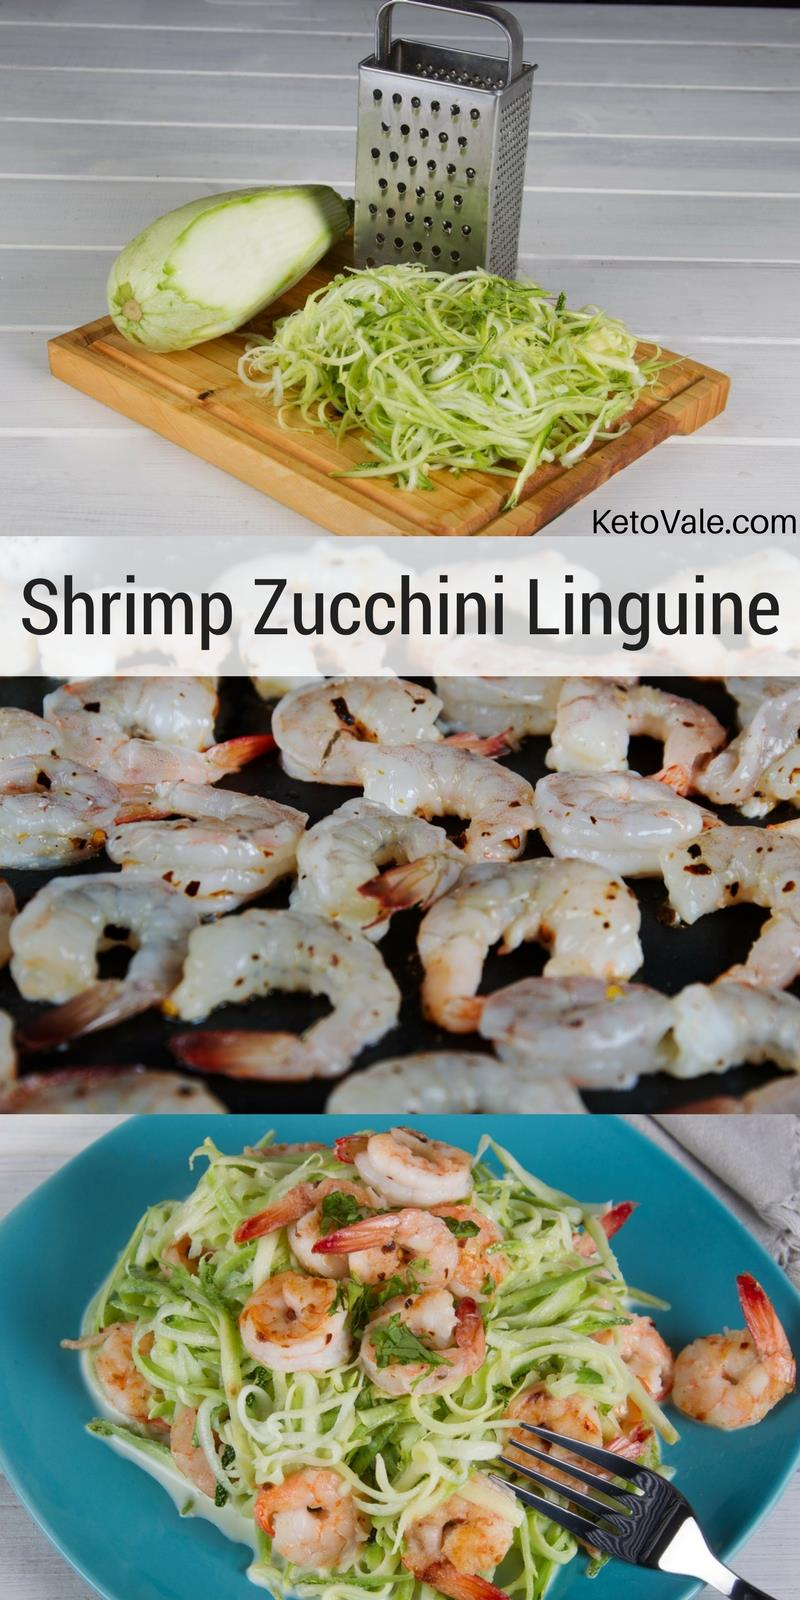 Shrimp Zucchini Linguini